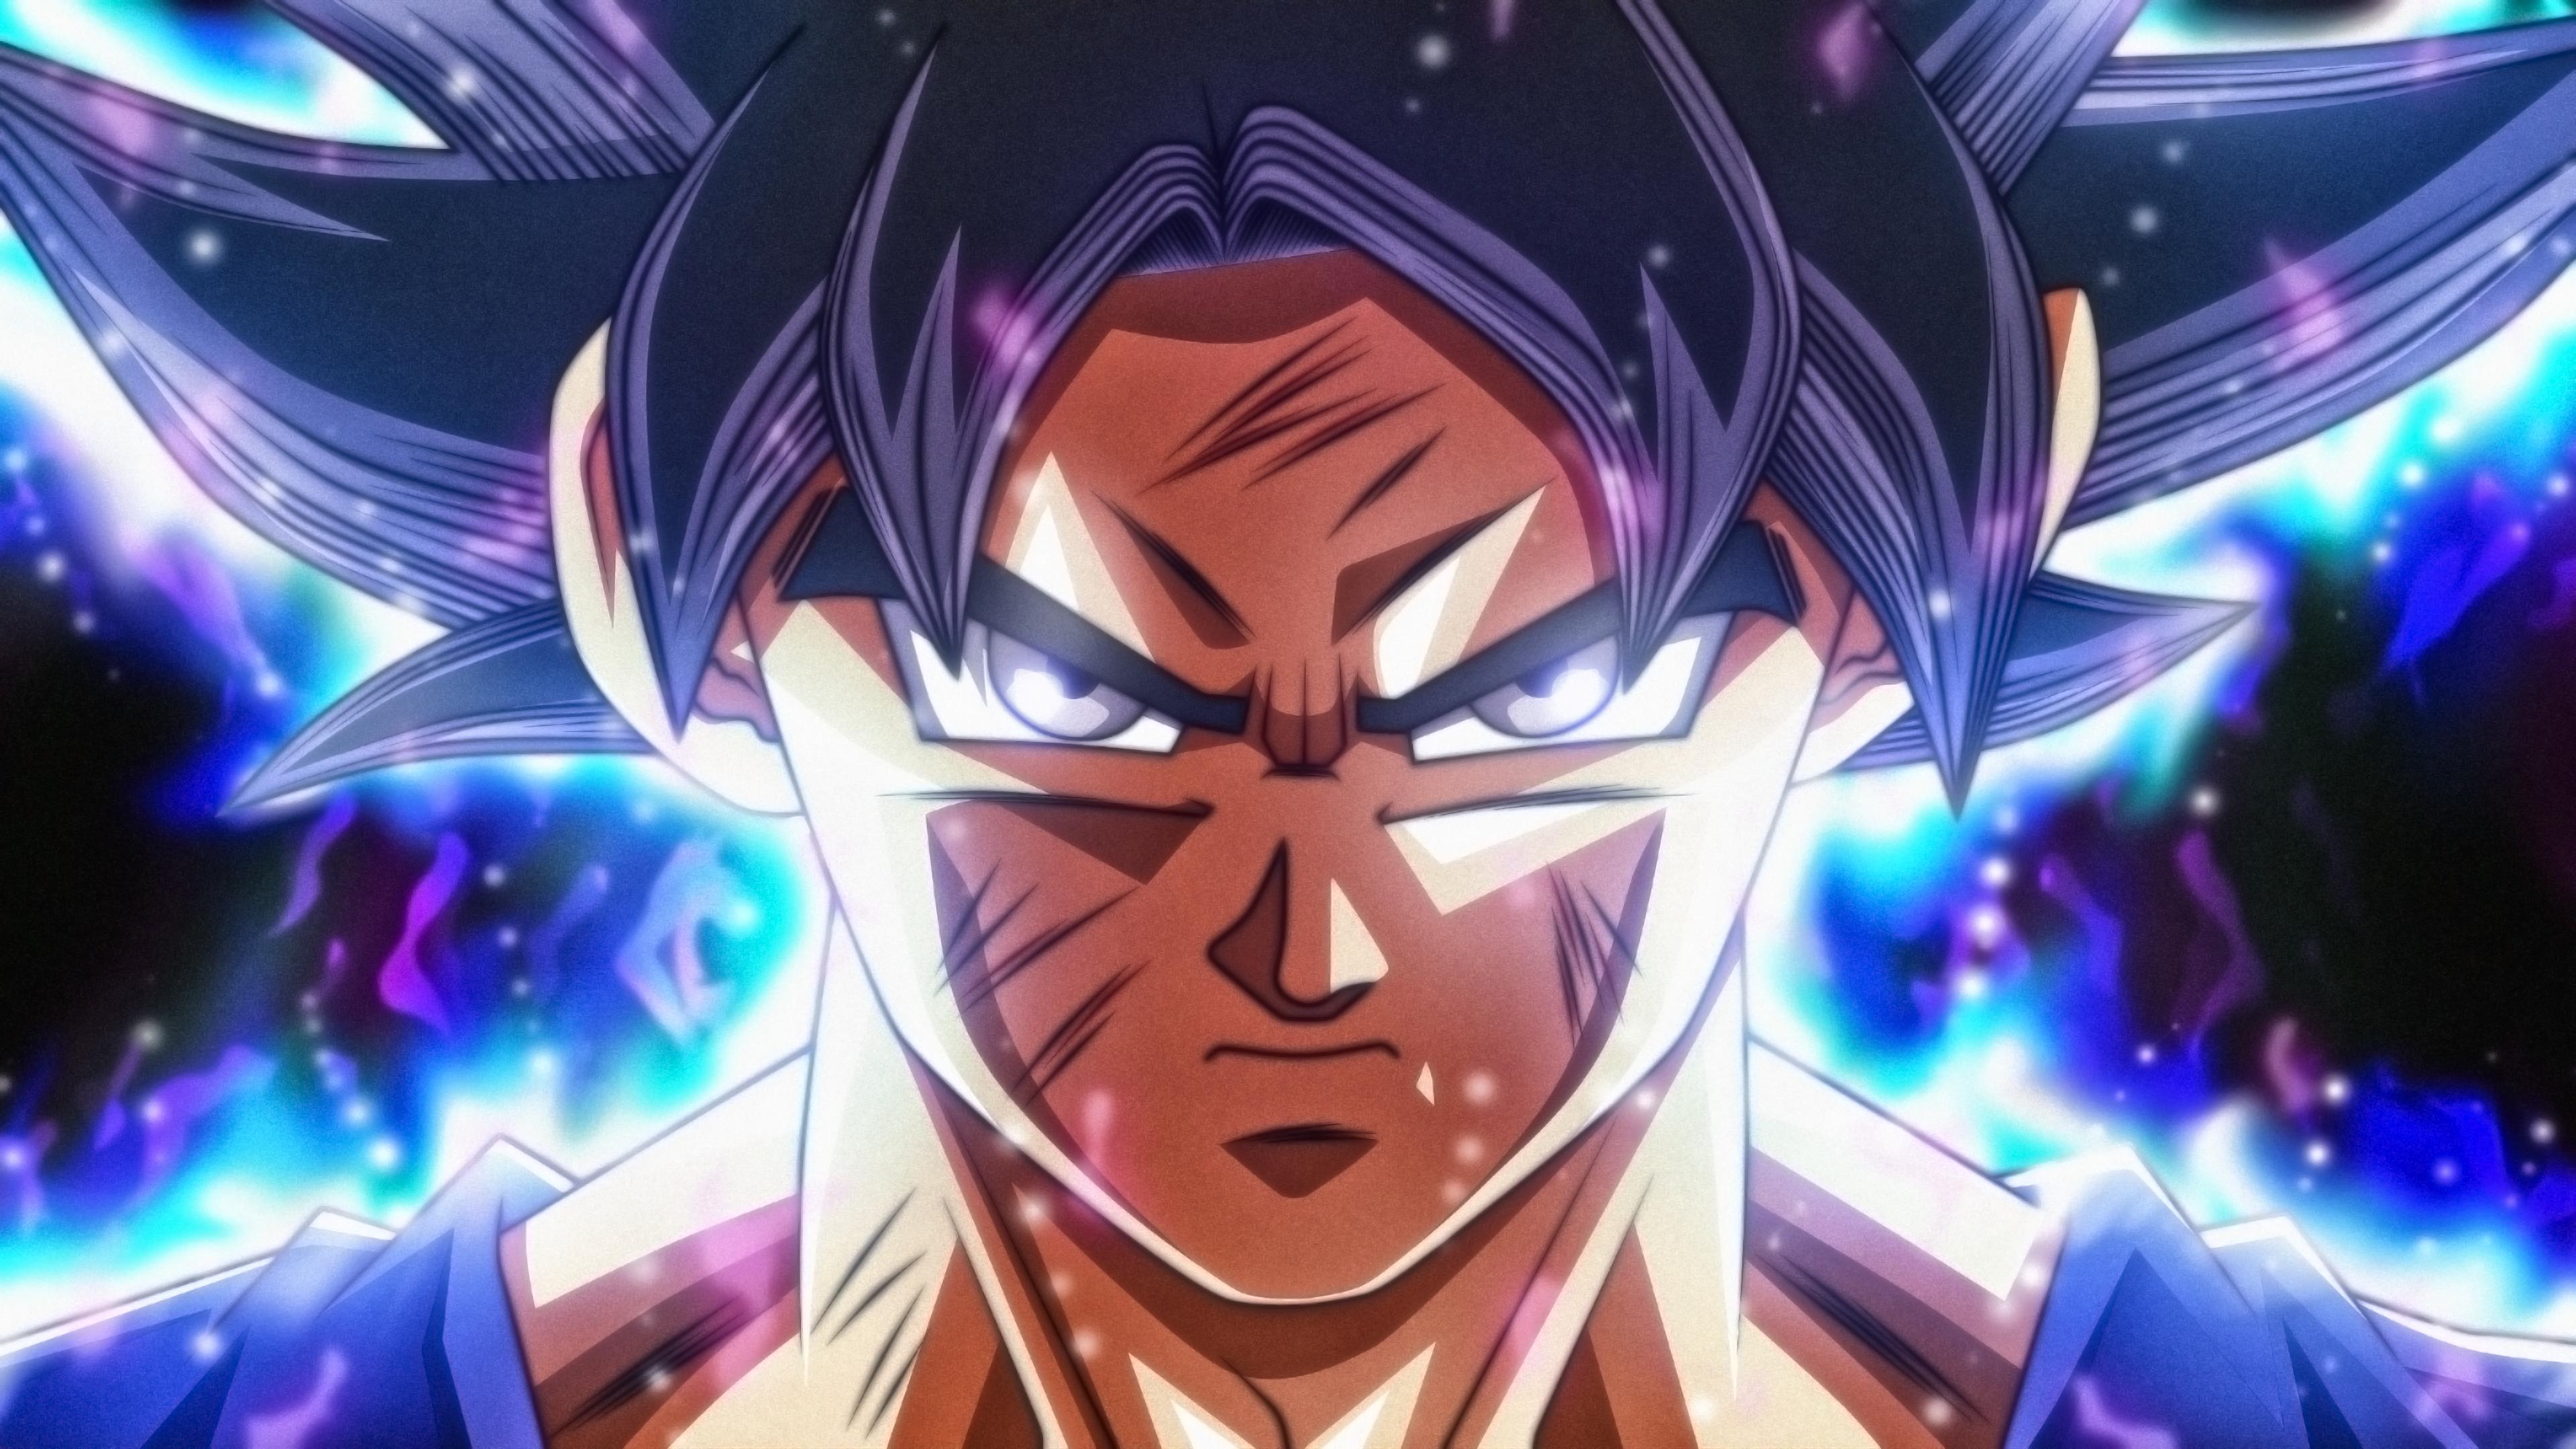 Anime 3840x2160 Dragon Ball Dragon Ball Super Son Goku ultra instict  rmehedi Super Saiyan anime boys anime face DeviantArt